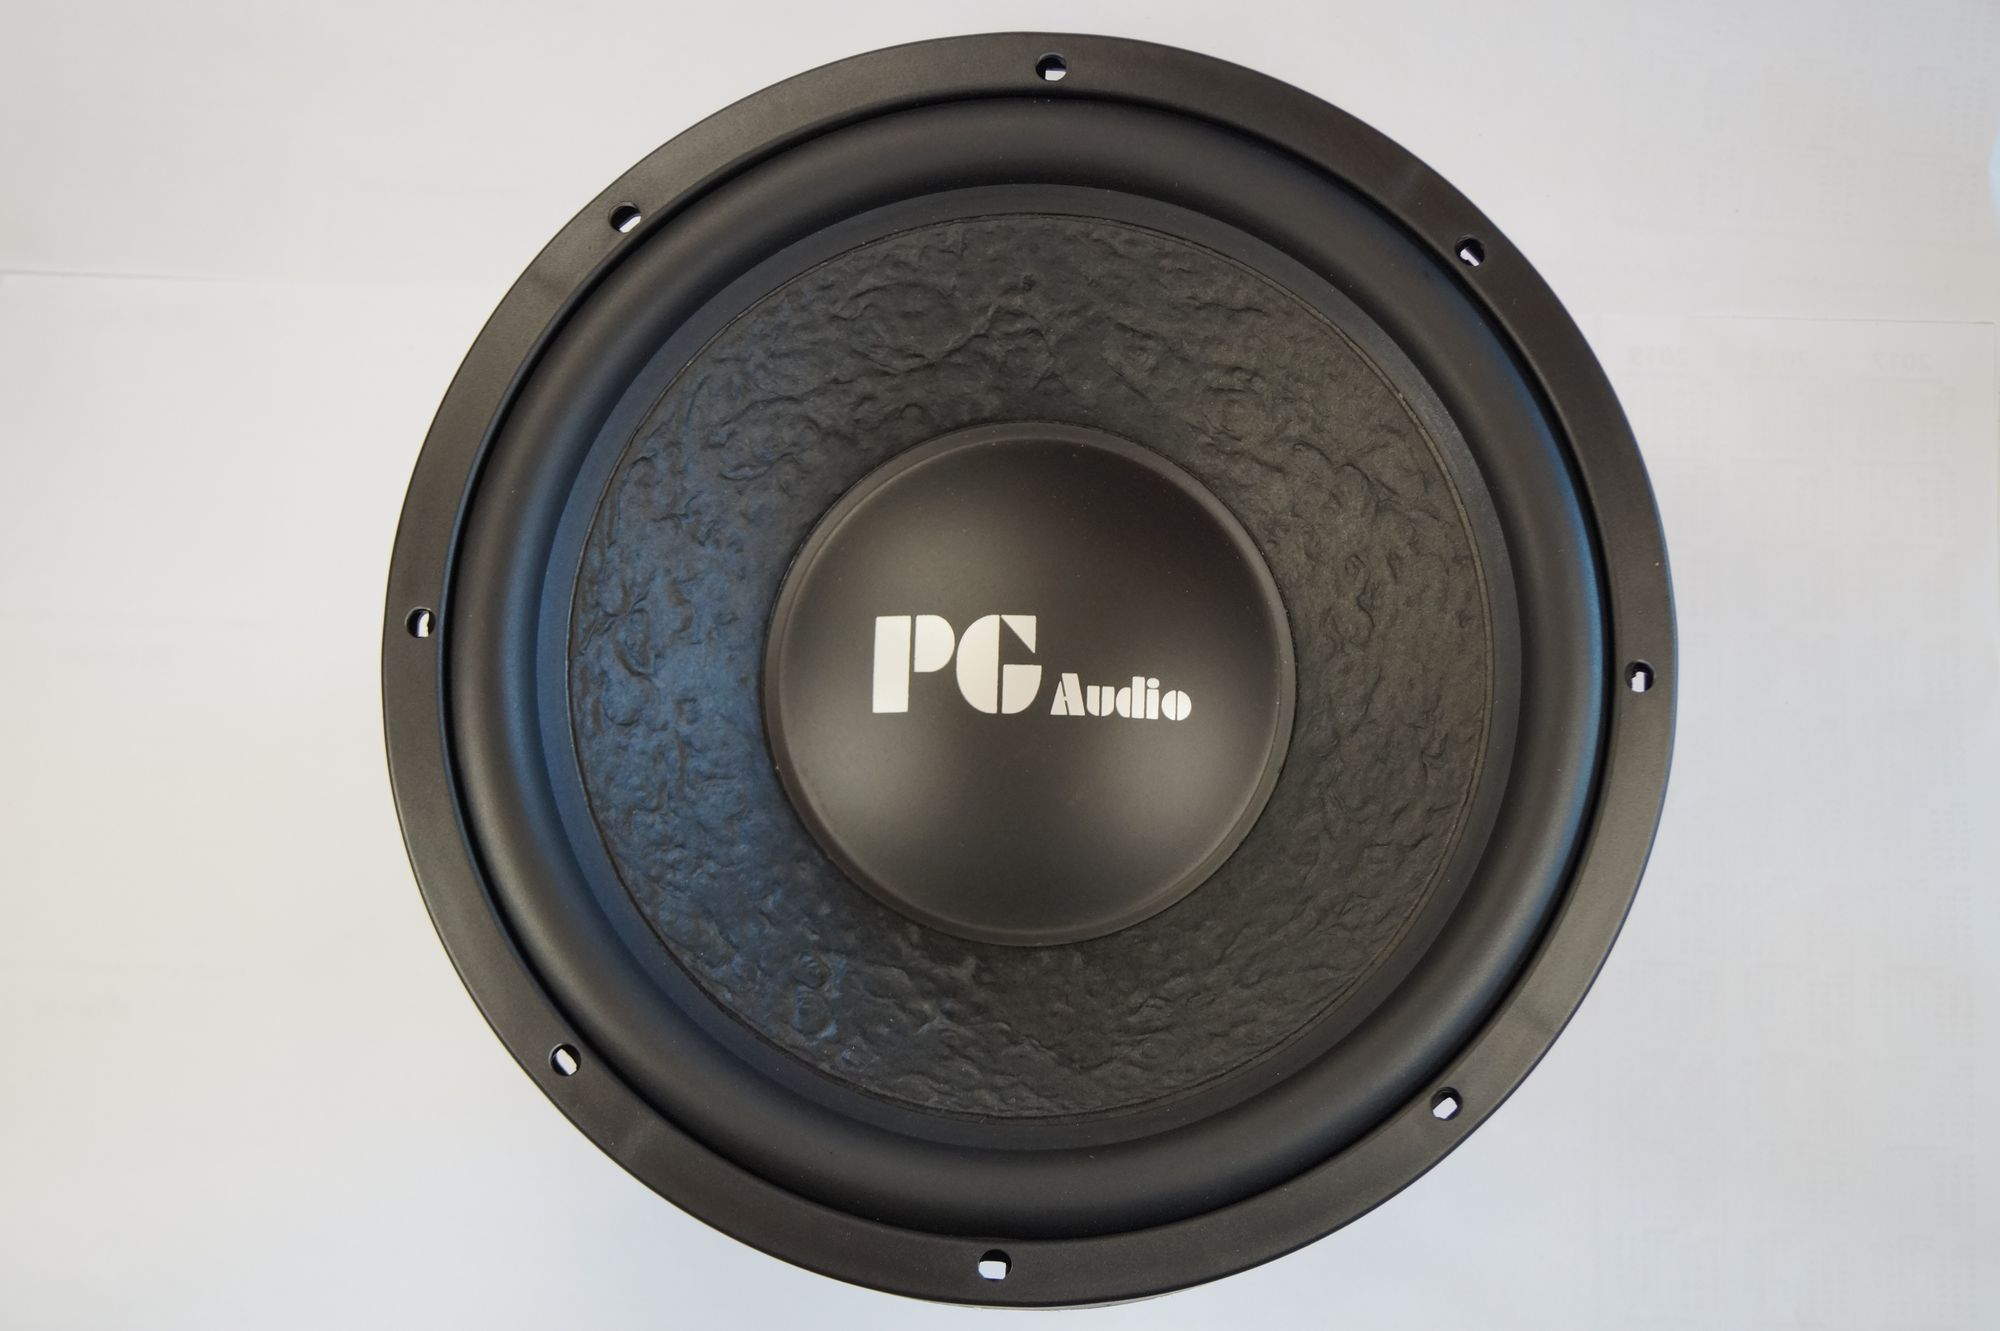 "PG Audio 1204 12"" 30 cm Subwoofer,Tieftöner,Basslautsprecher 600 Watt max., NEU 001"